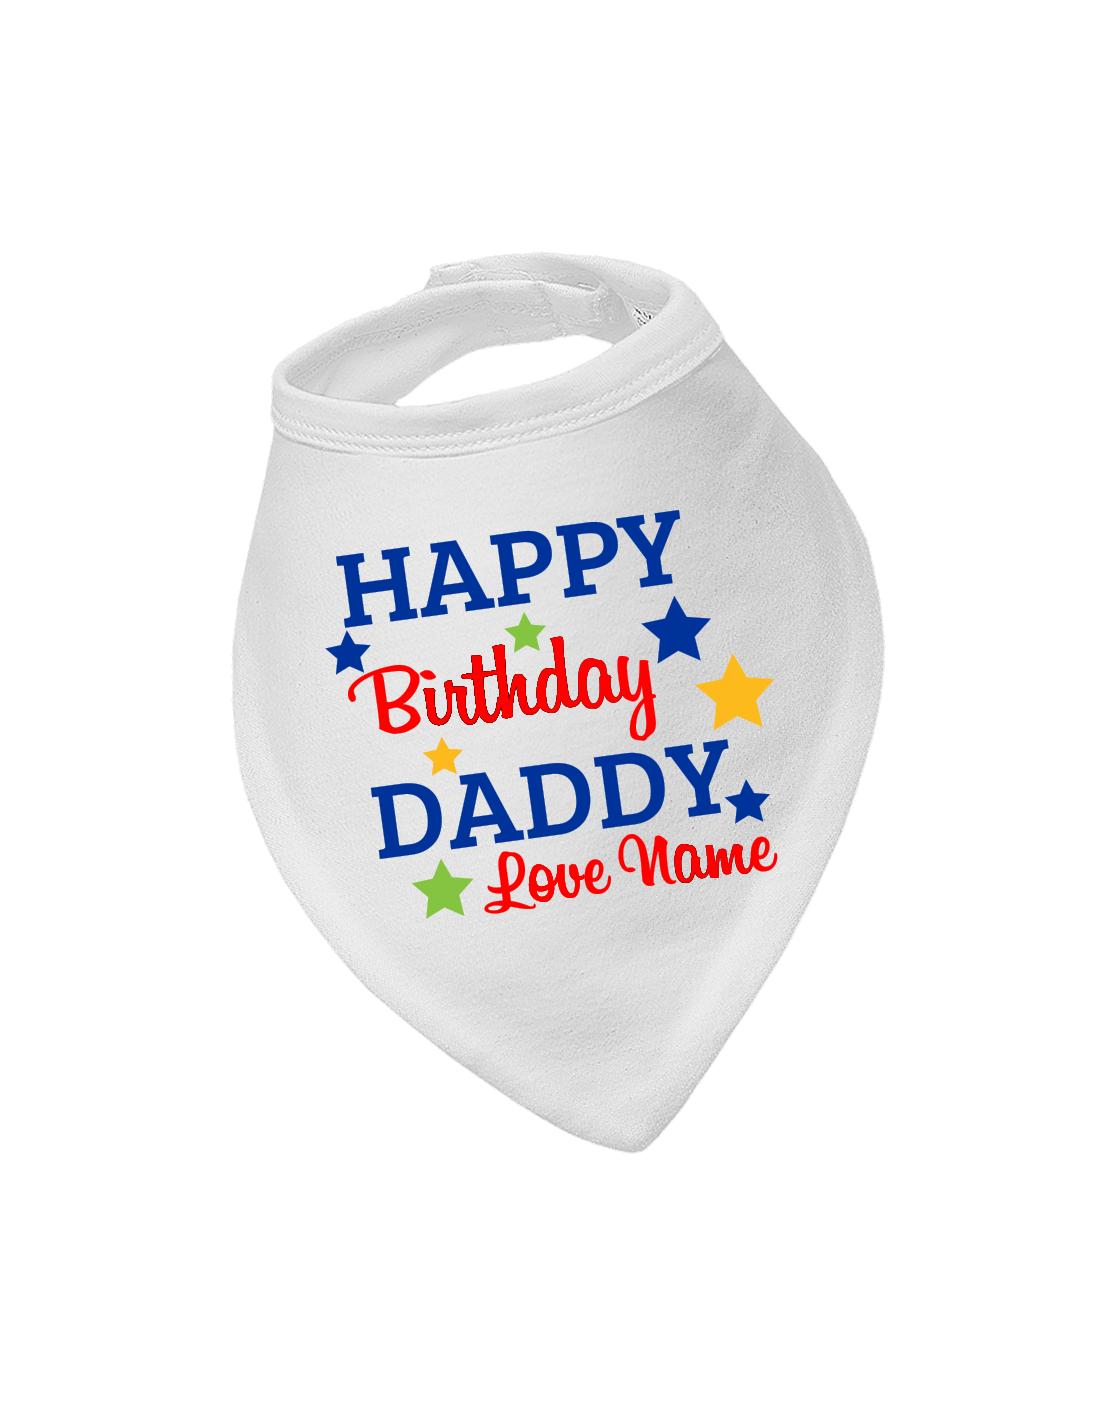 I Love You with personalised name Baby Bandana Bib Happy Birthday Daddy..